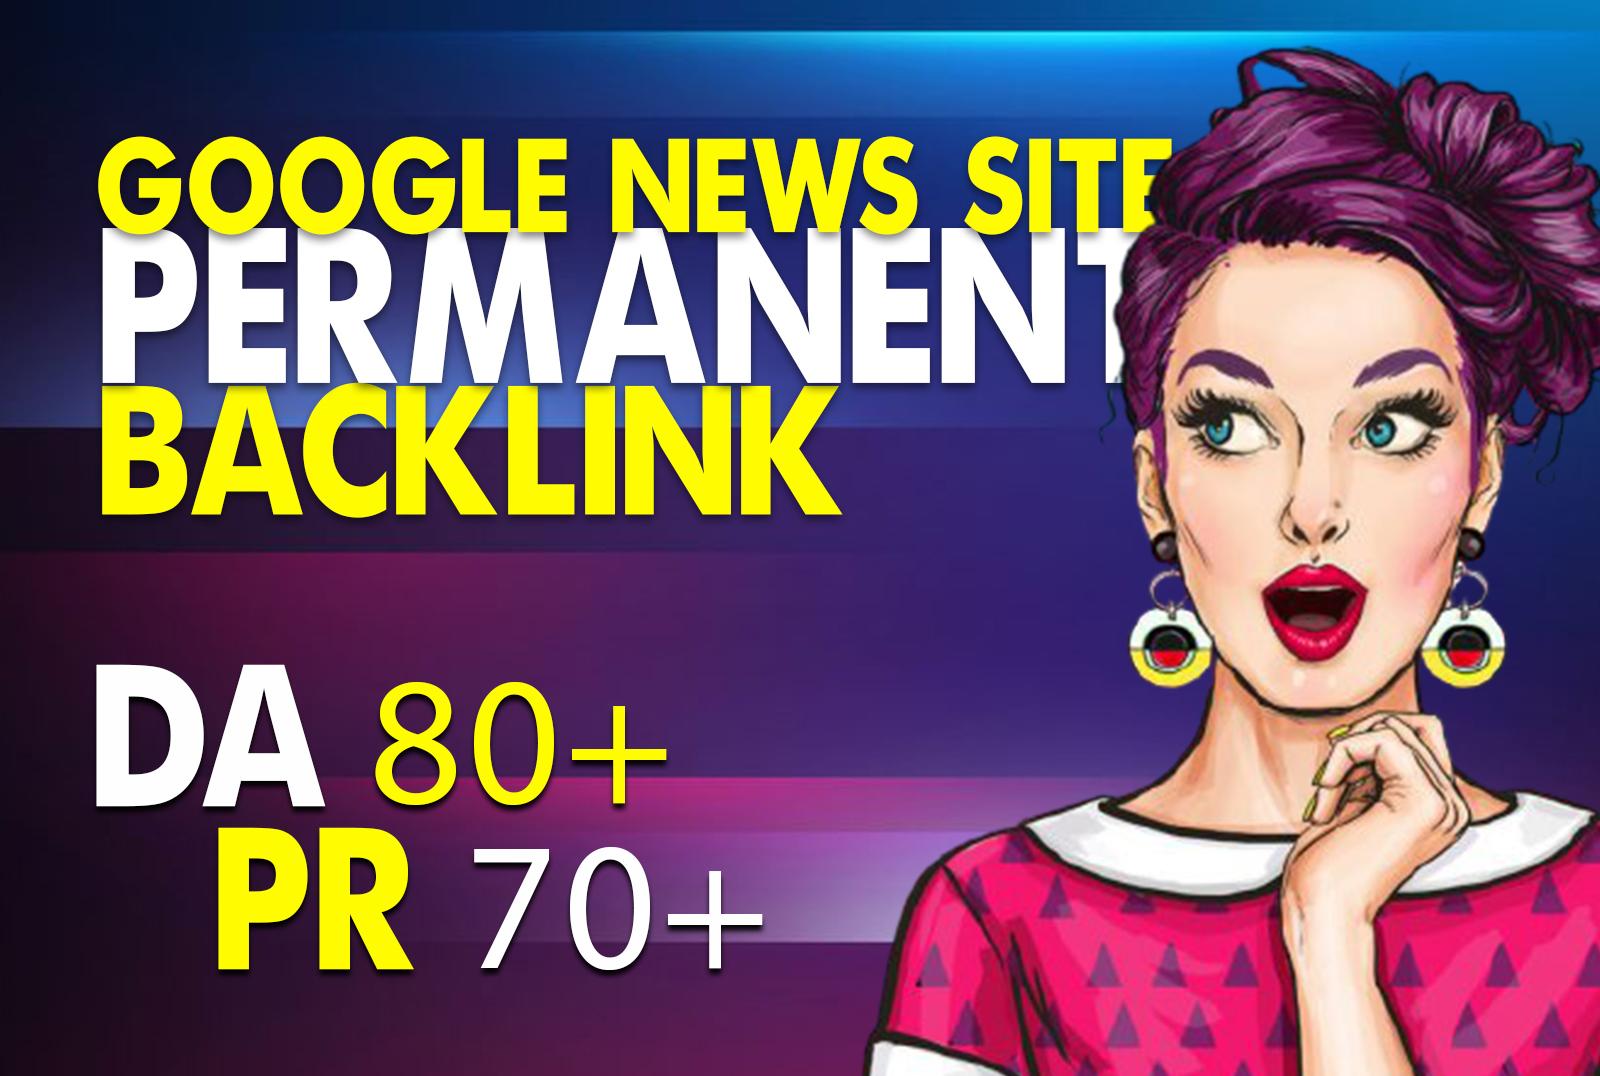 guest posting da 80 google news site permanent dofollow link